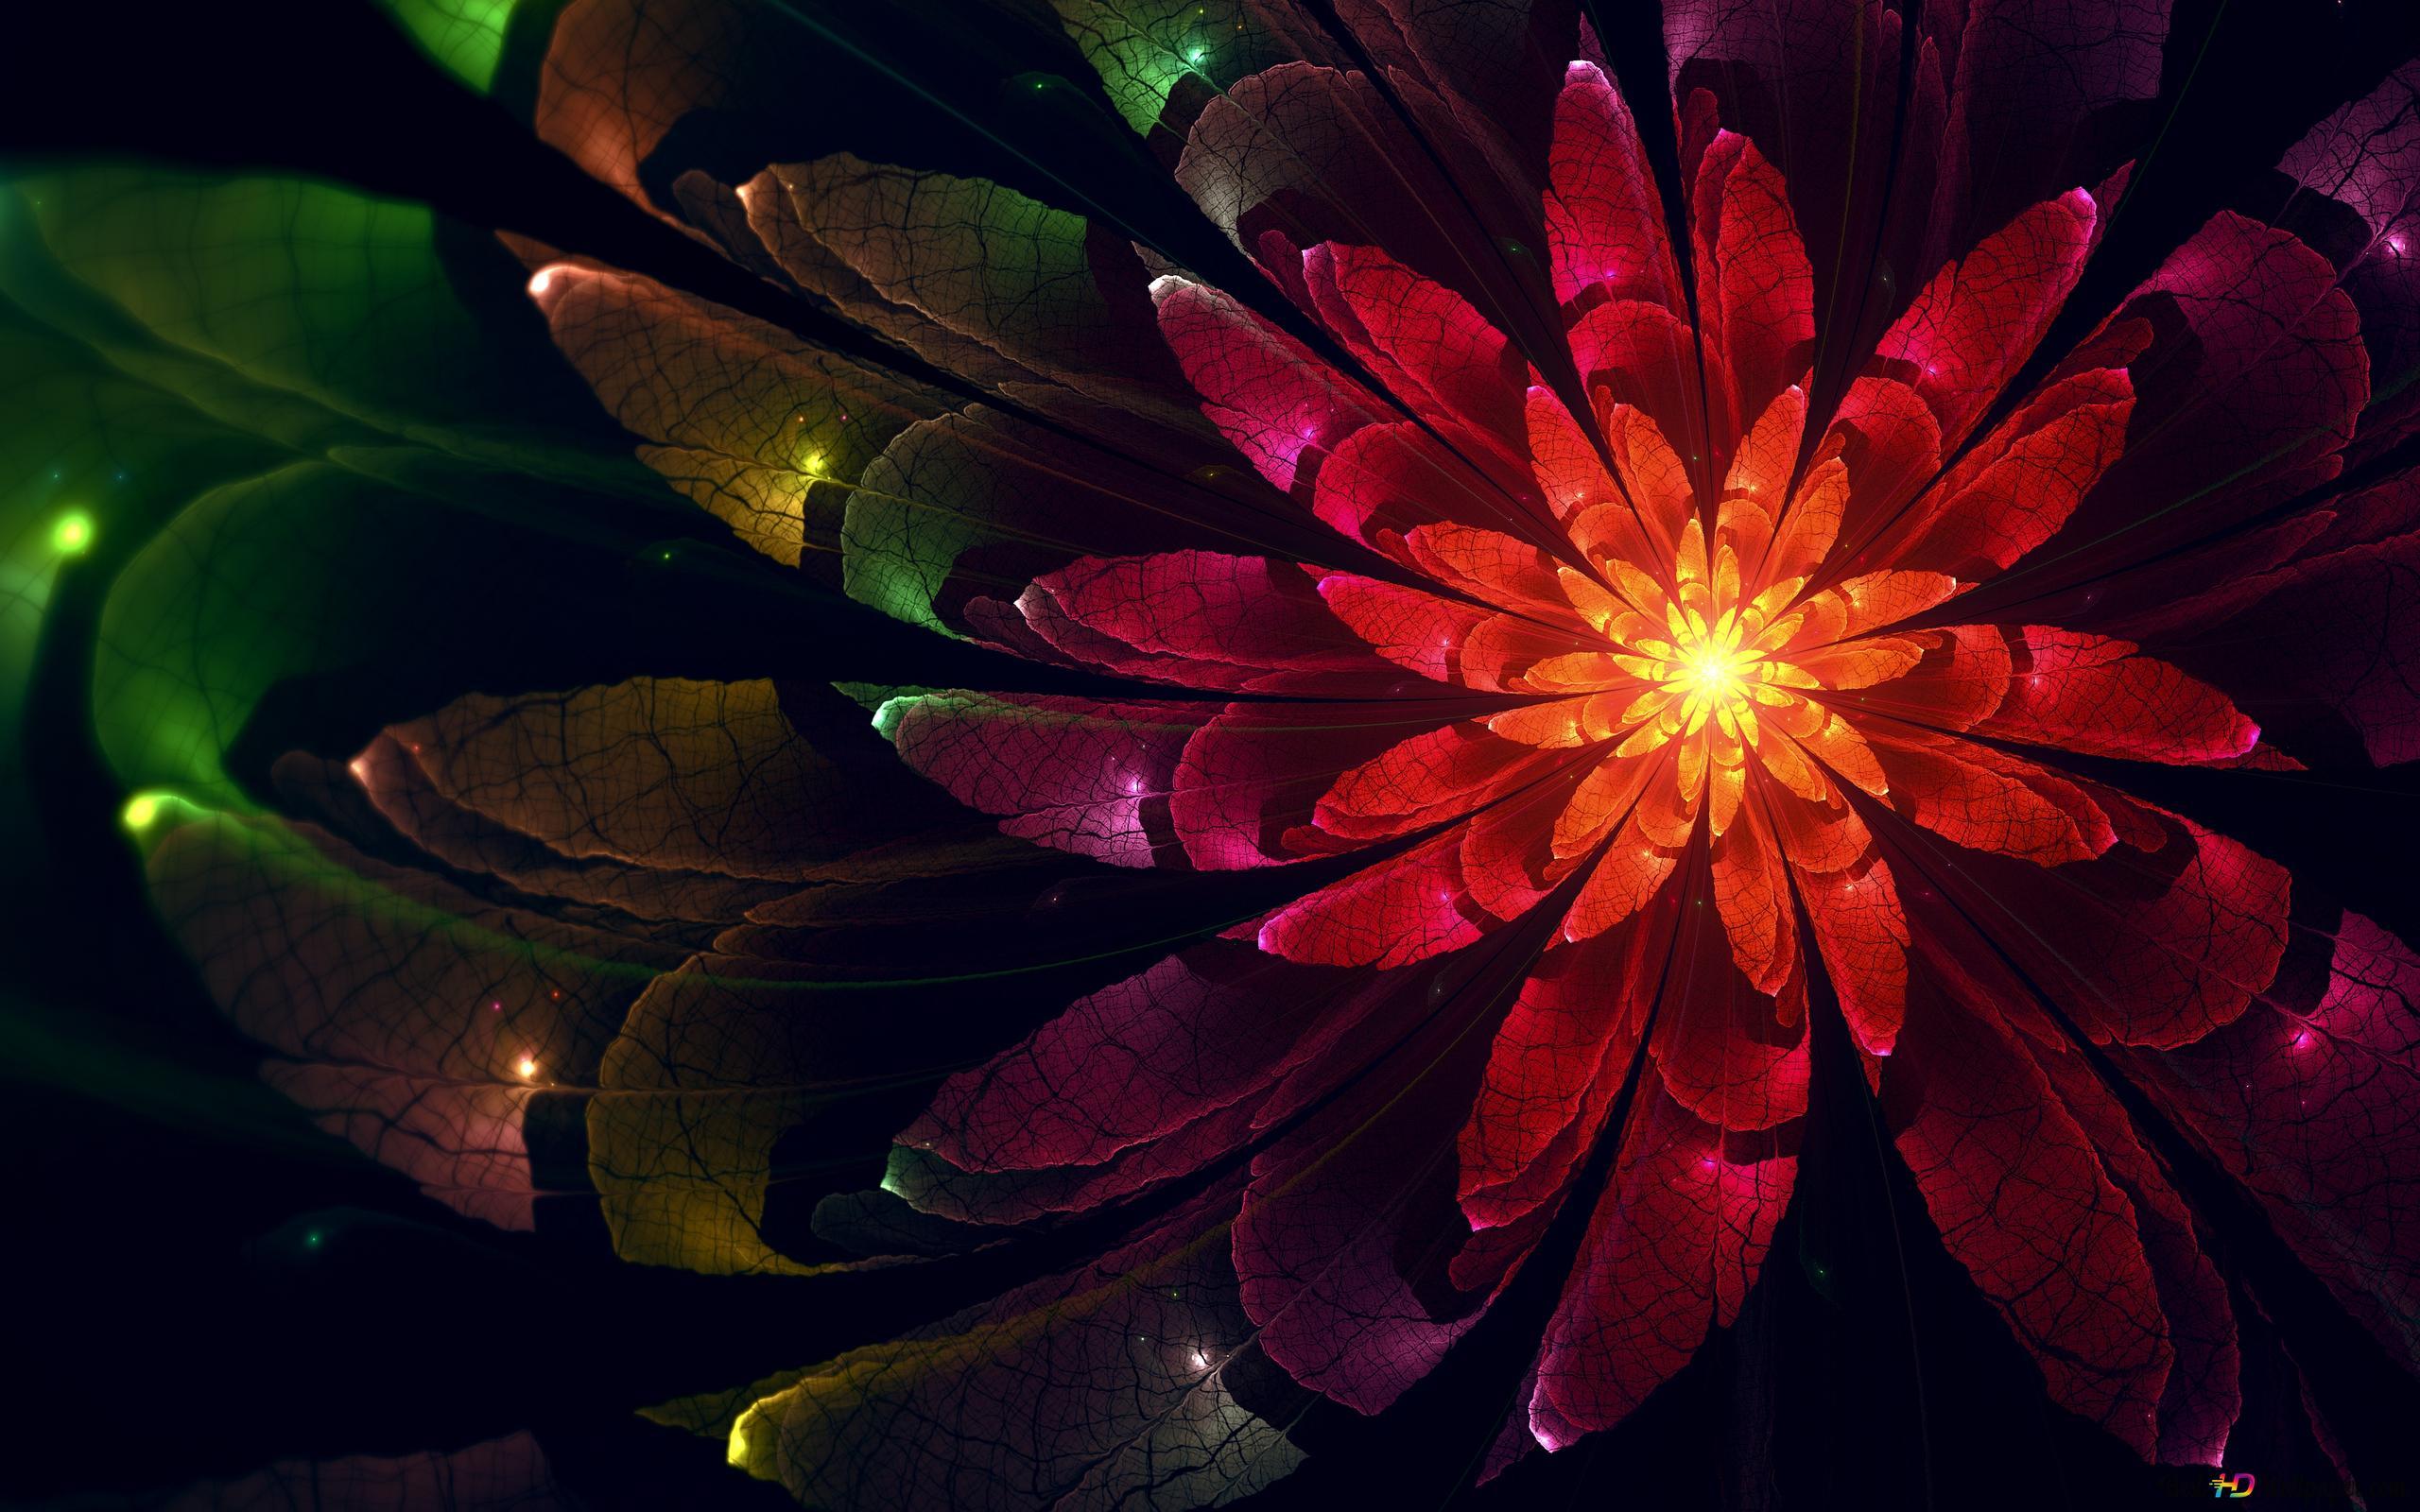 Digital Fractal Flower Hd Wallpaper Download